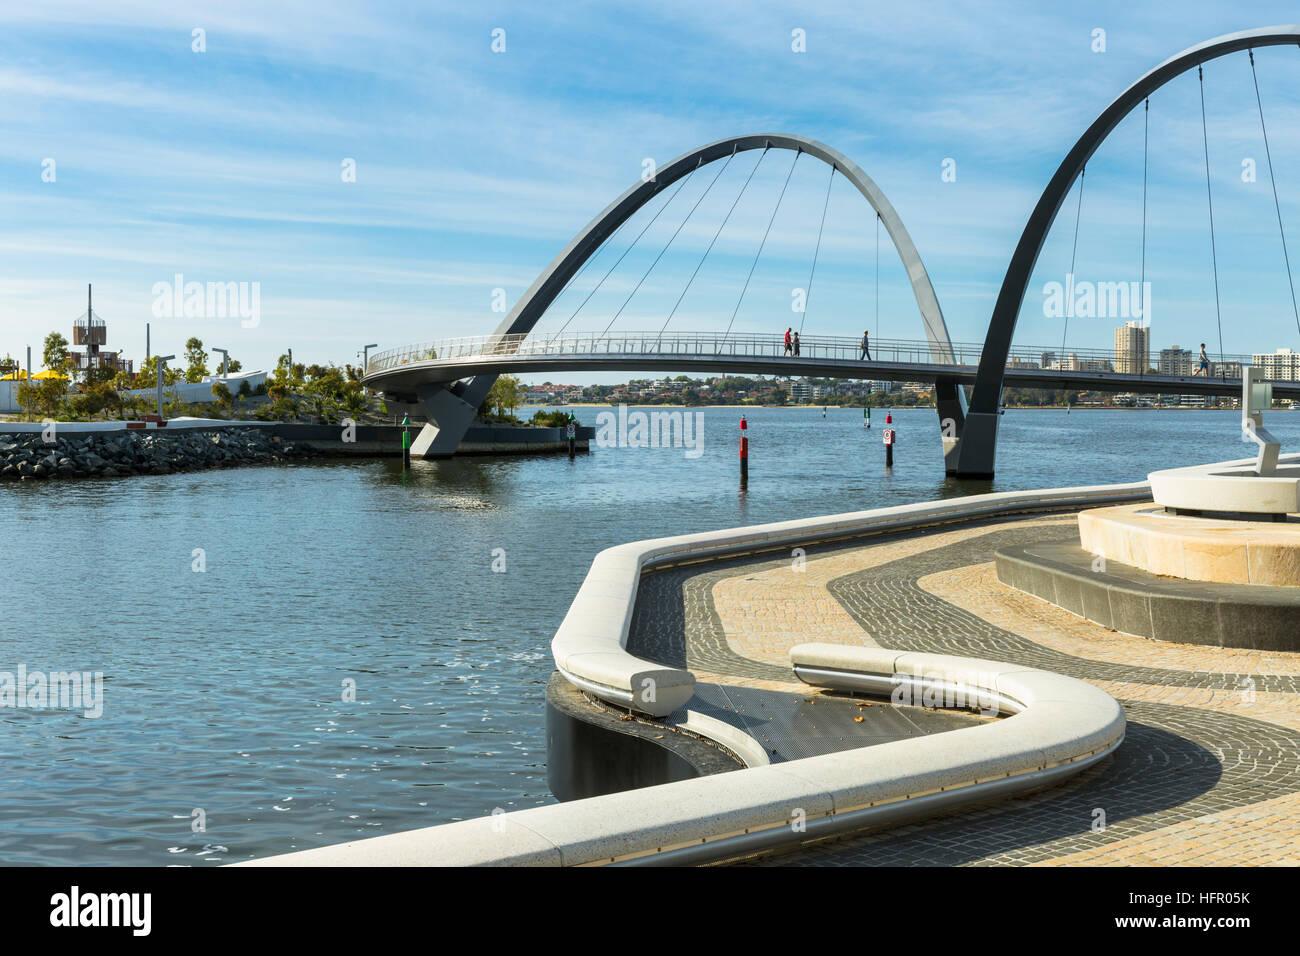 View along the promenade at Elizabeth Quay towards the pedestrian bridge, Perth, Western Australia, Australia Stock Photo